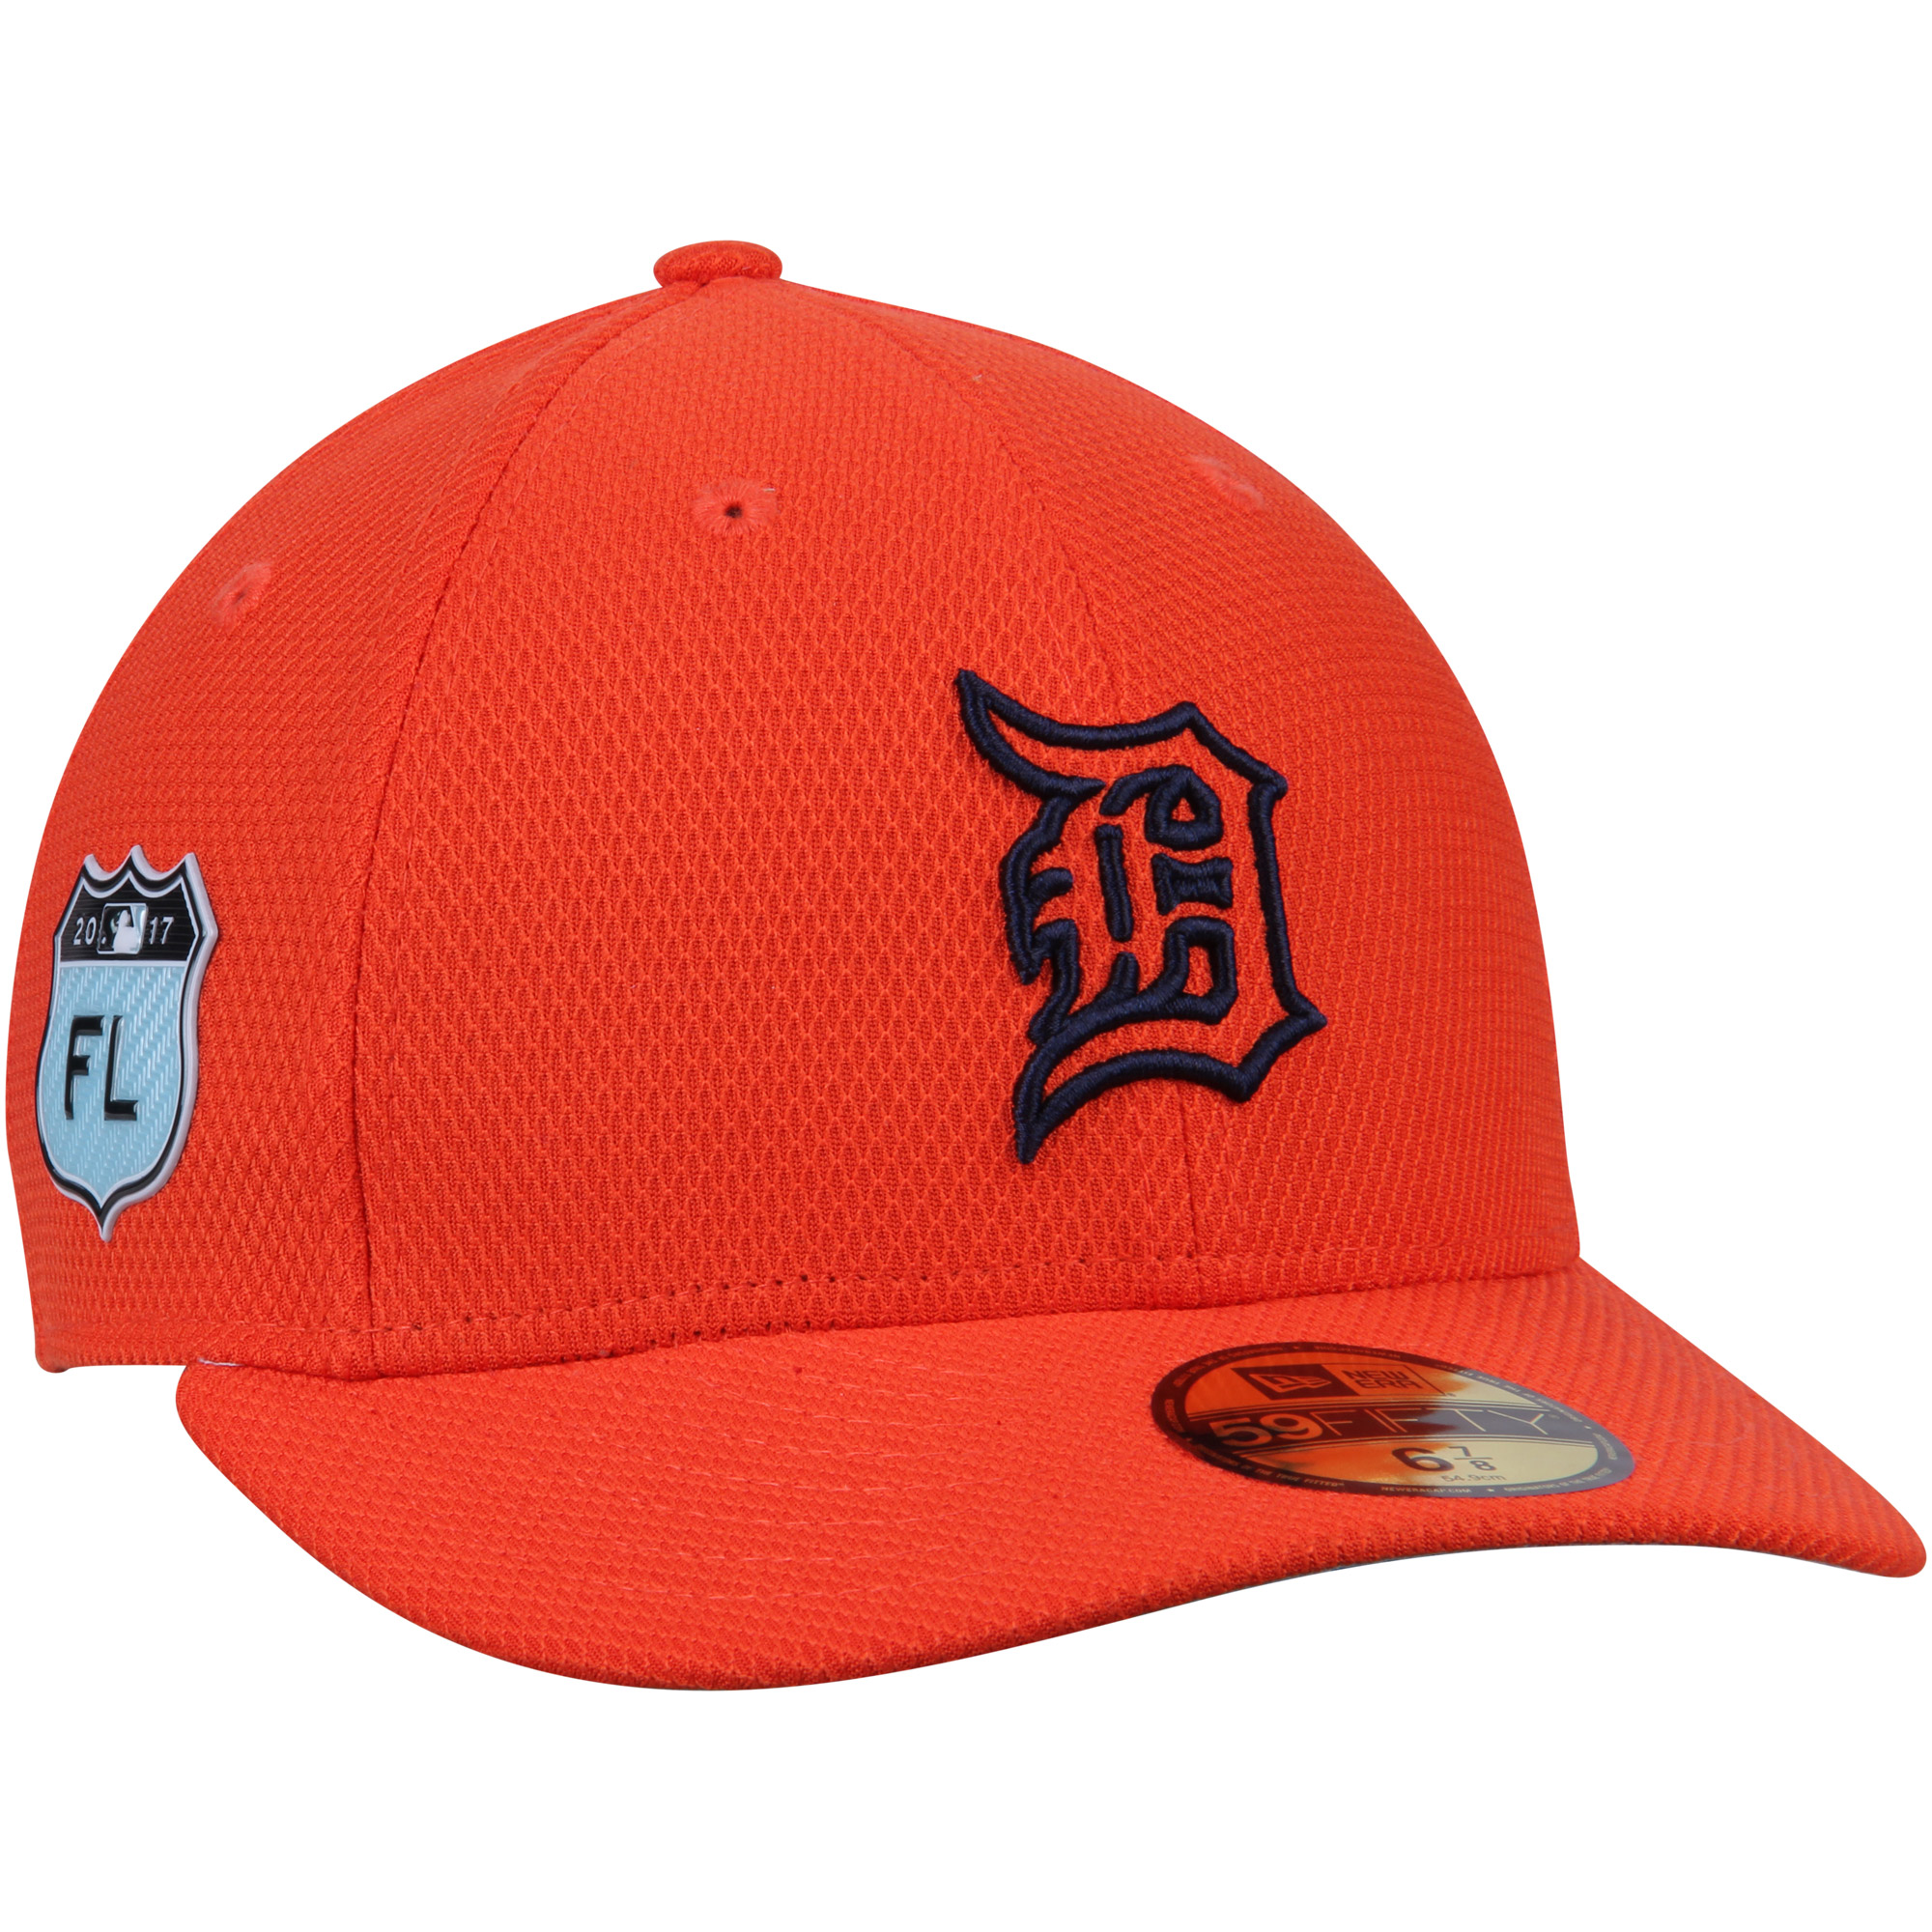 Detroit Tigers New Era 2017 Spring Training Diamond Era Low Profile 59FIFTY Fitted Hat - Orange